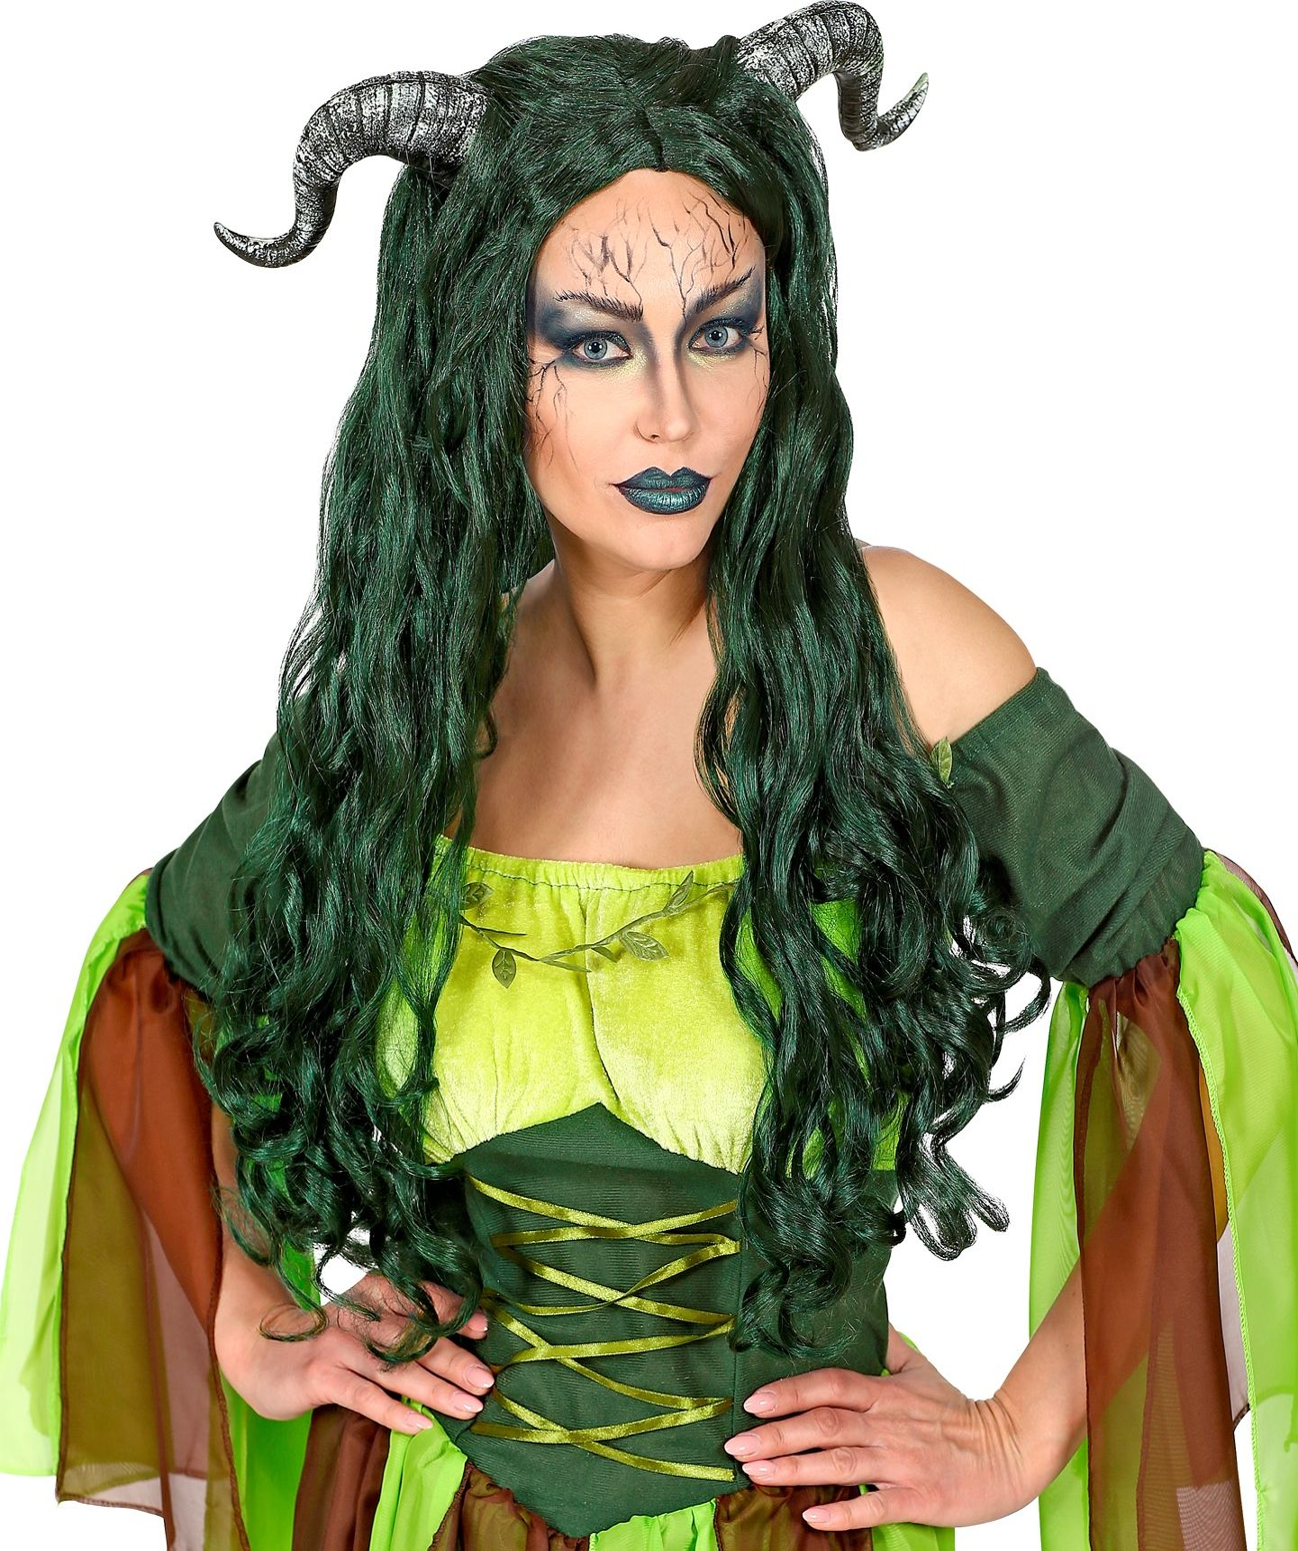 Groene lange heksen pruik